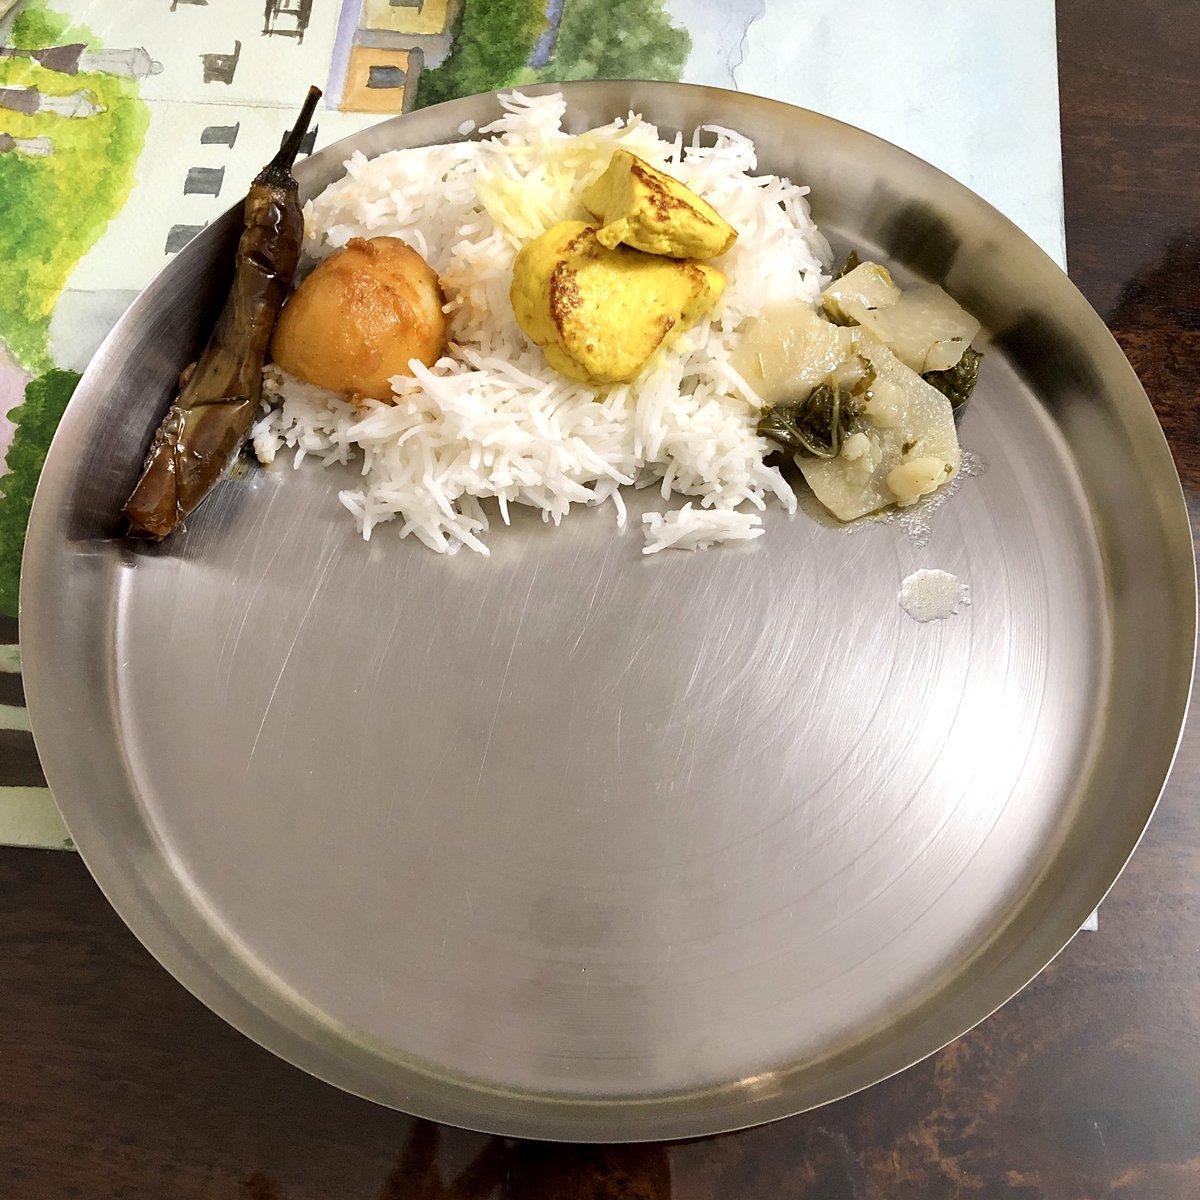 Typical Faak'e Baate on Zyeth'e Aetham. Simple and most fulfilling 🙏🏼😋.   (Veg food served on ashtami in Kashmiri Pandit families)  I am not on fast though 😬.   #ZyethAtham #JyeshtaAshtami #KashmiriPandits #Kashmir #Home #Tulmul